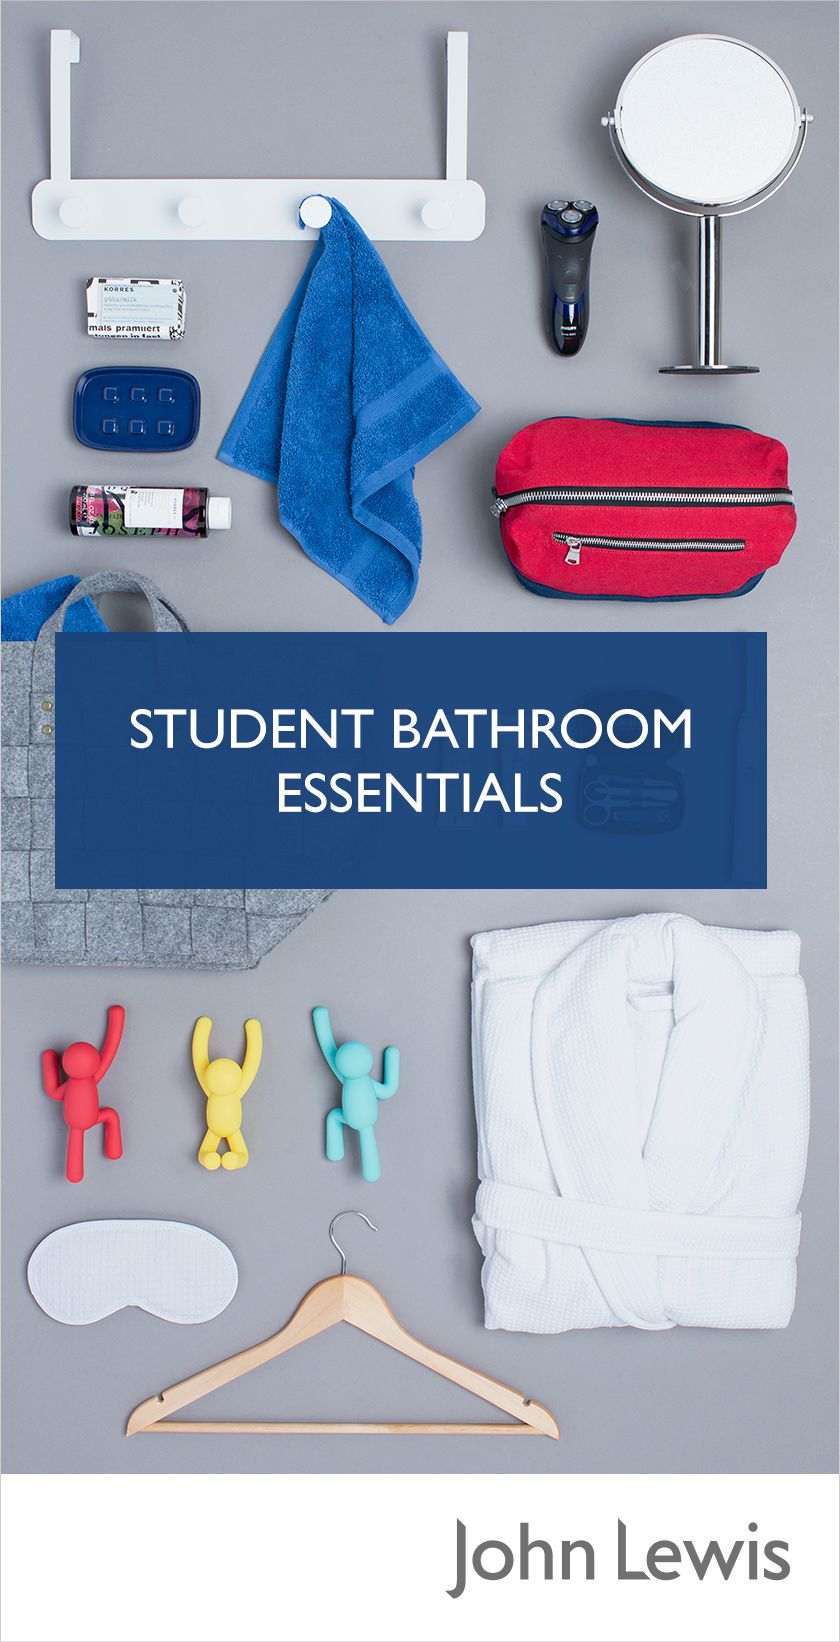 Bathroom accessories john lewis - Bathroom Accessories